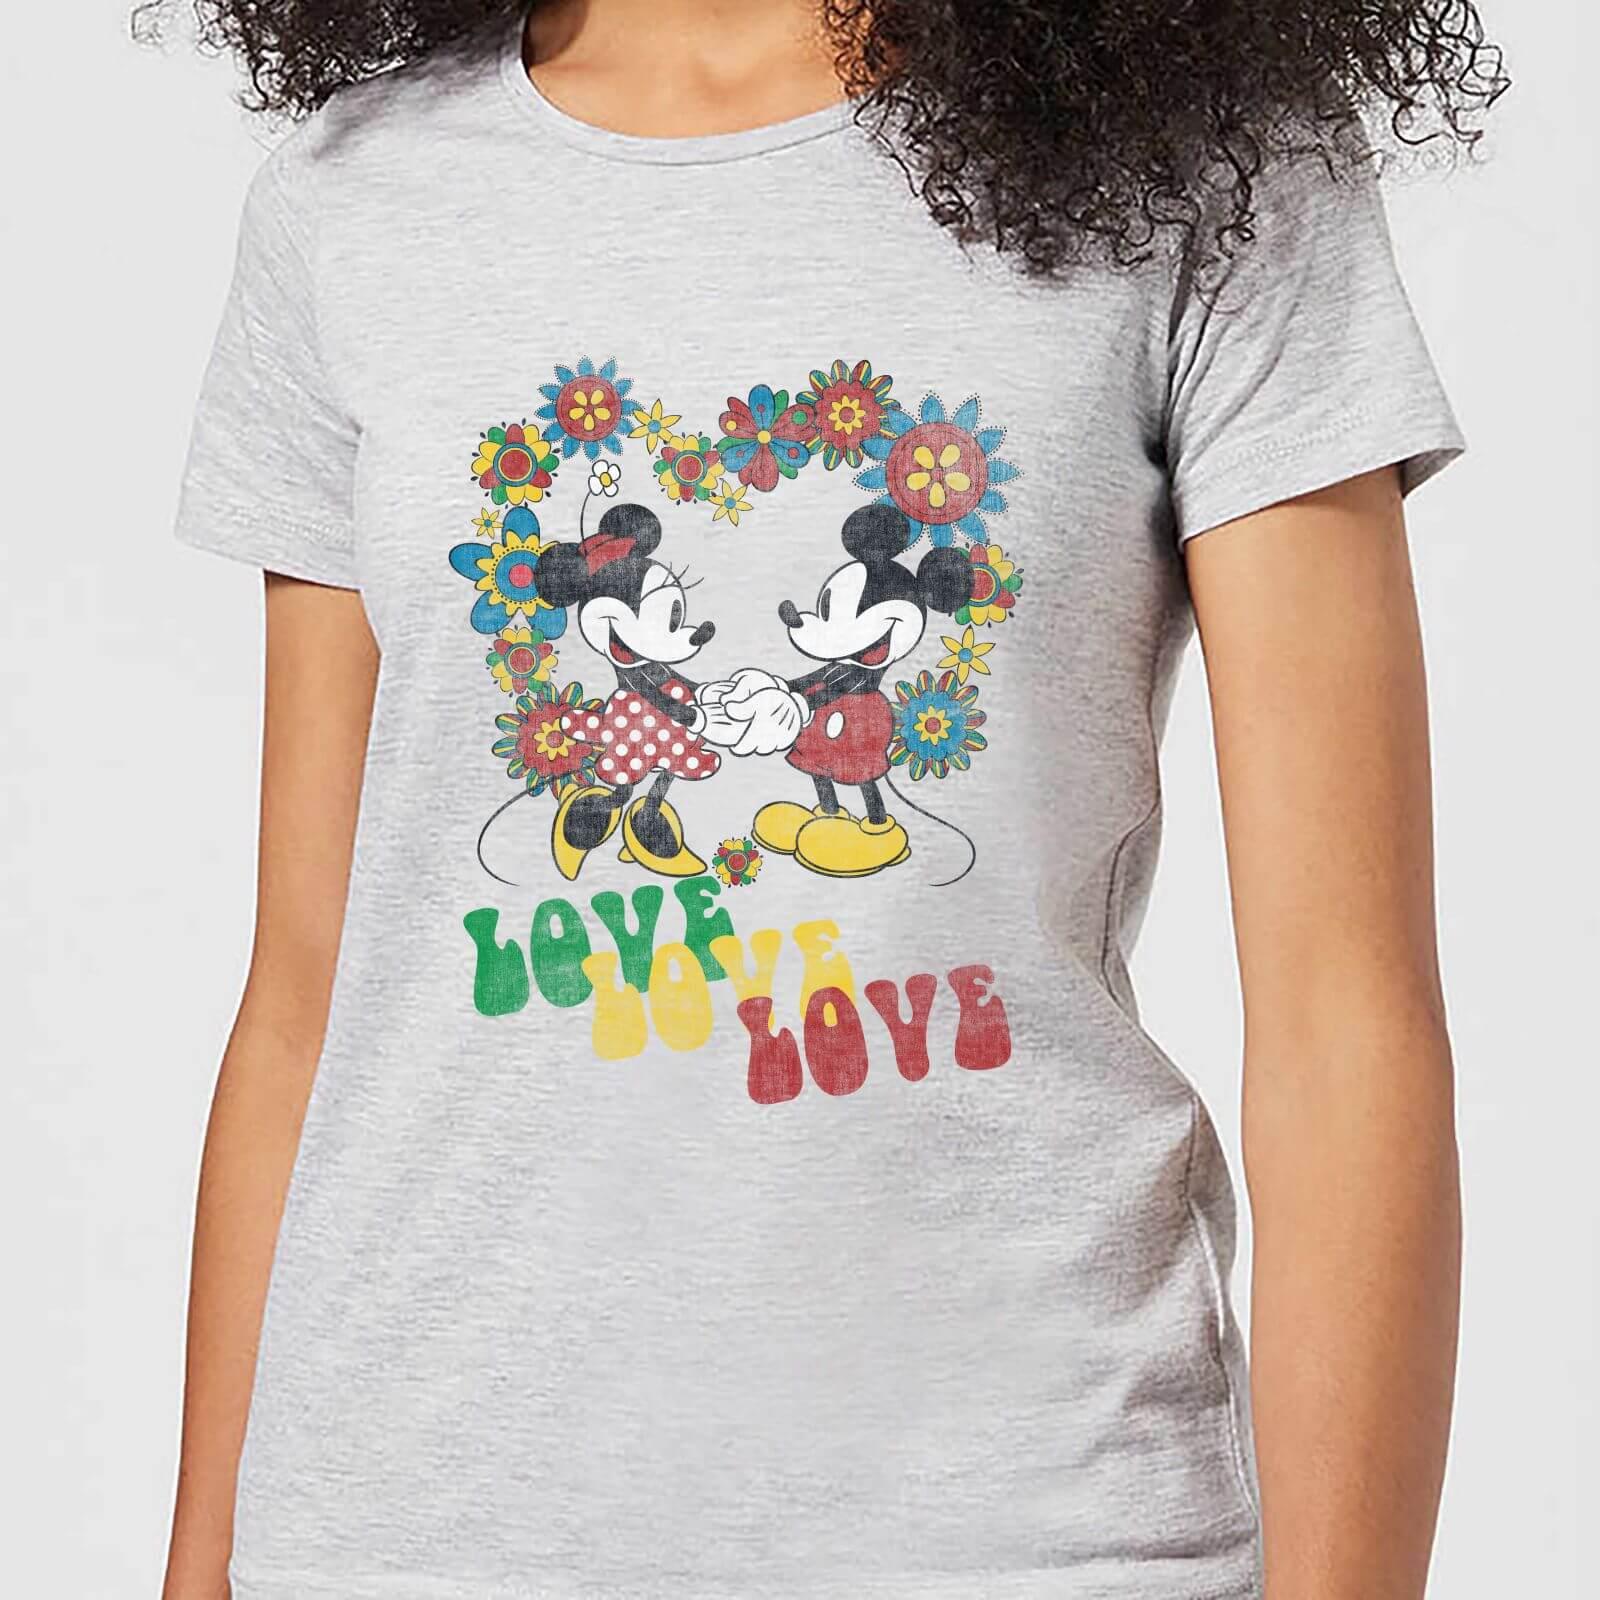 Disney Mickey Mouse Hippie Love Women's T-Shirt - Grey - L - Grey